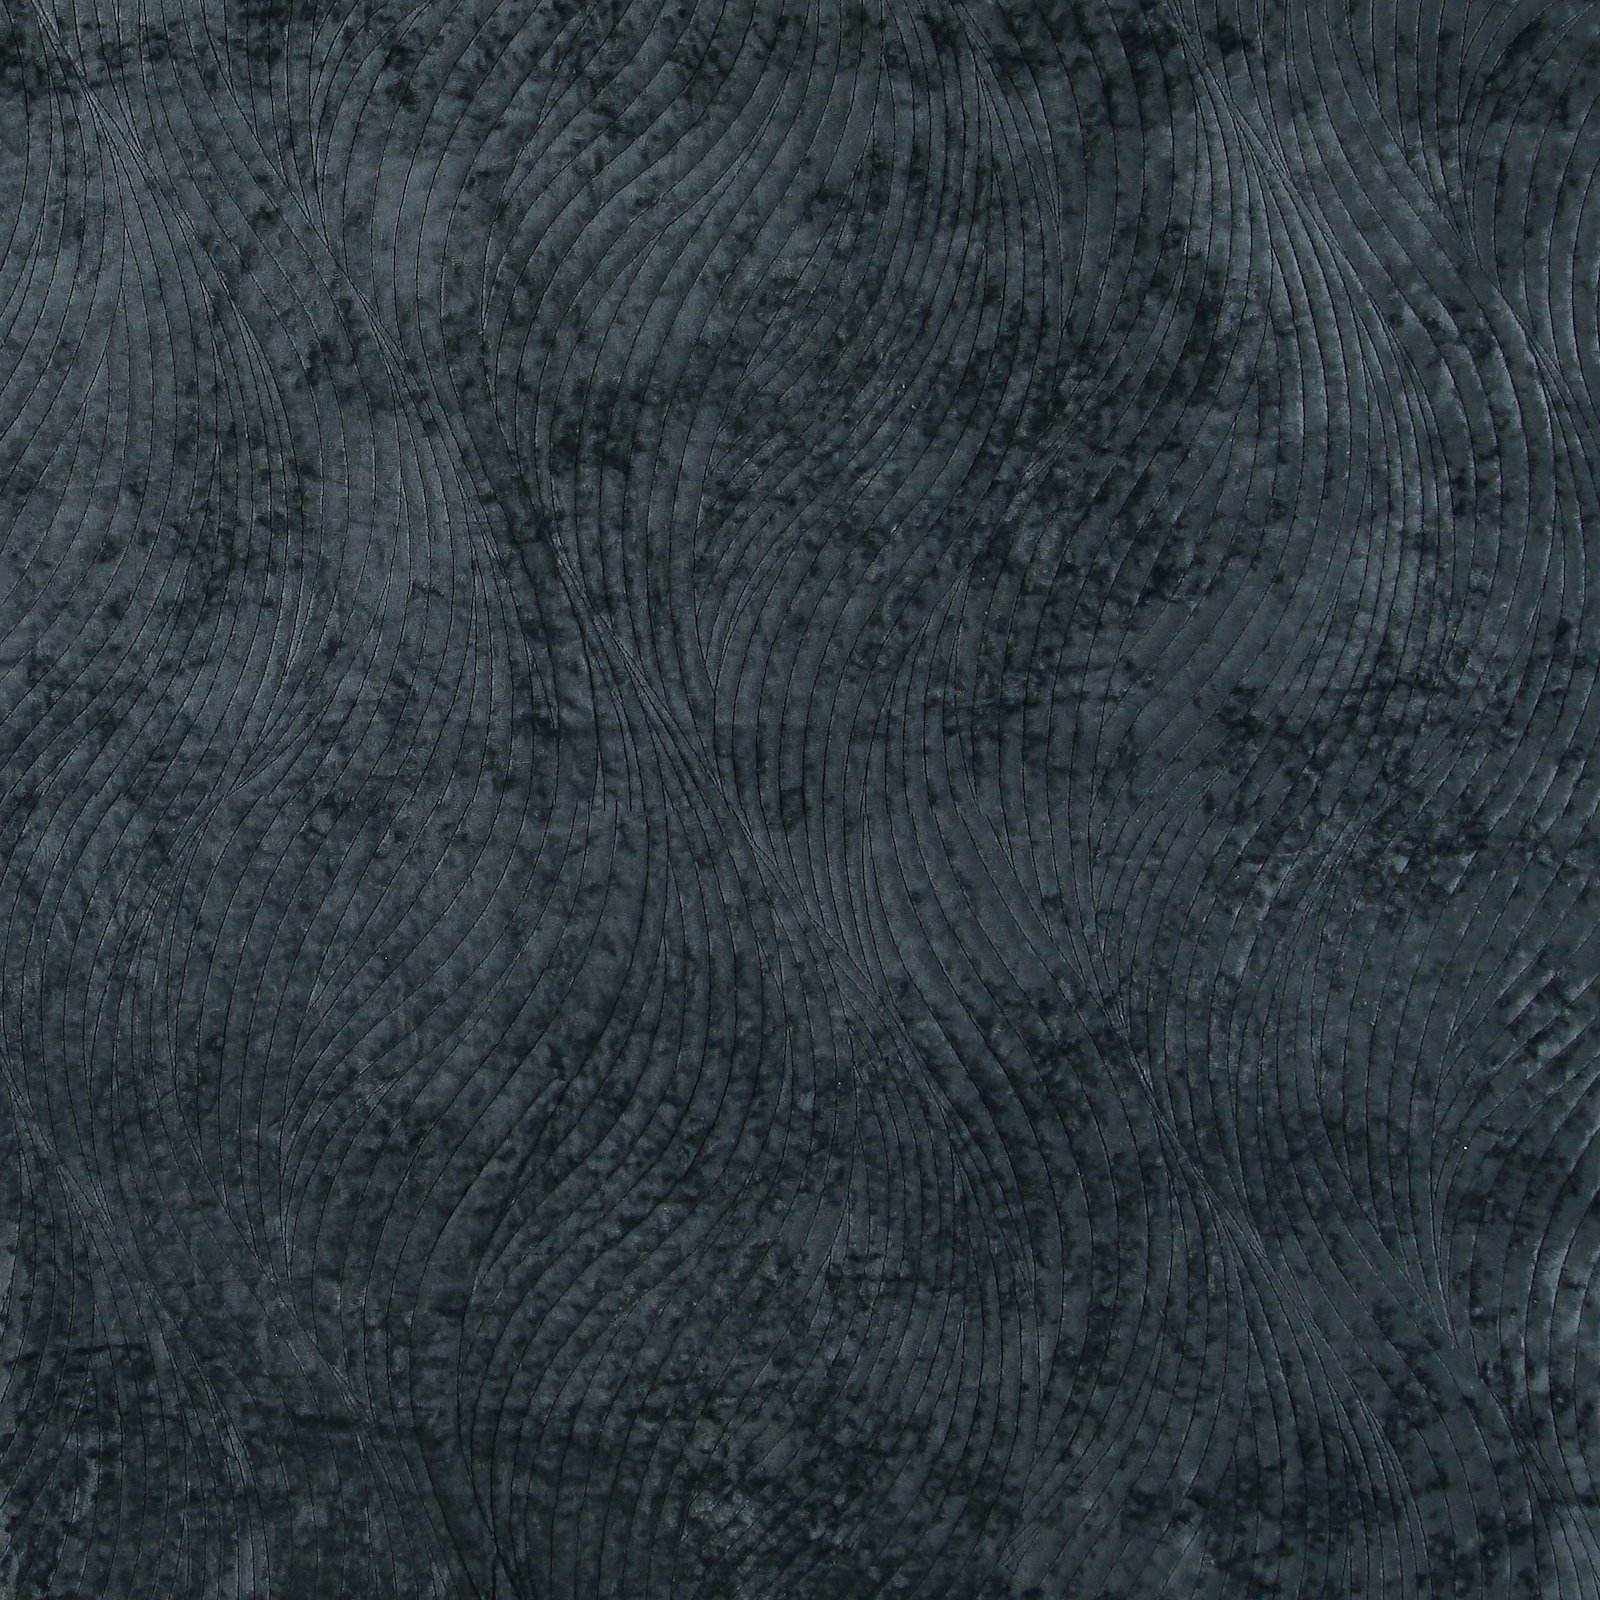 Gequilteter Samt, Blaugrau abstr. Muster 920216_pack_solid